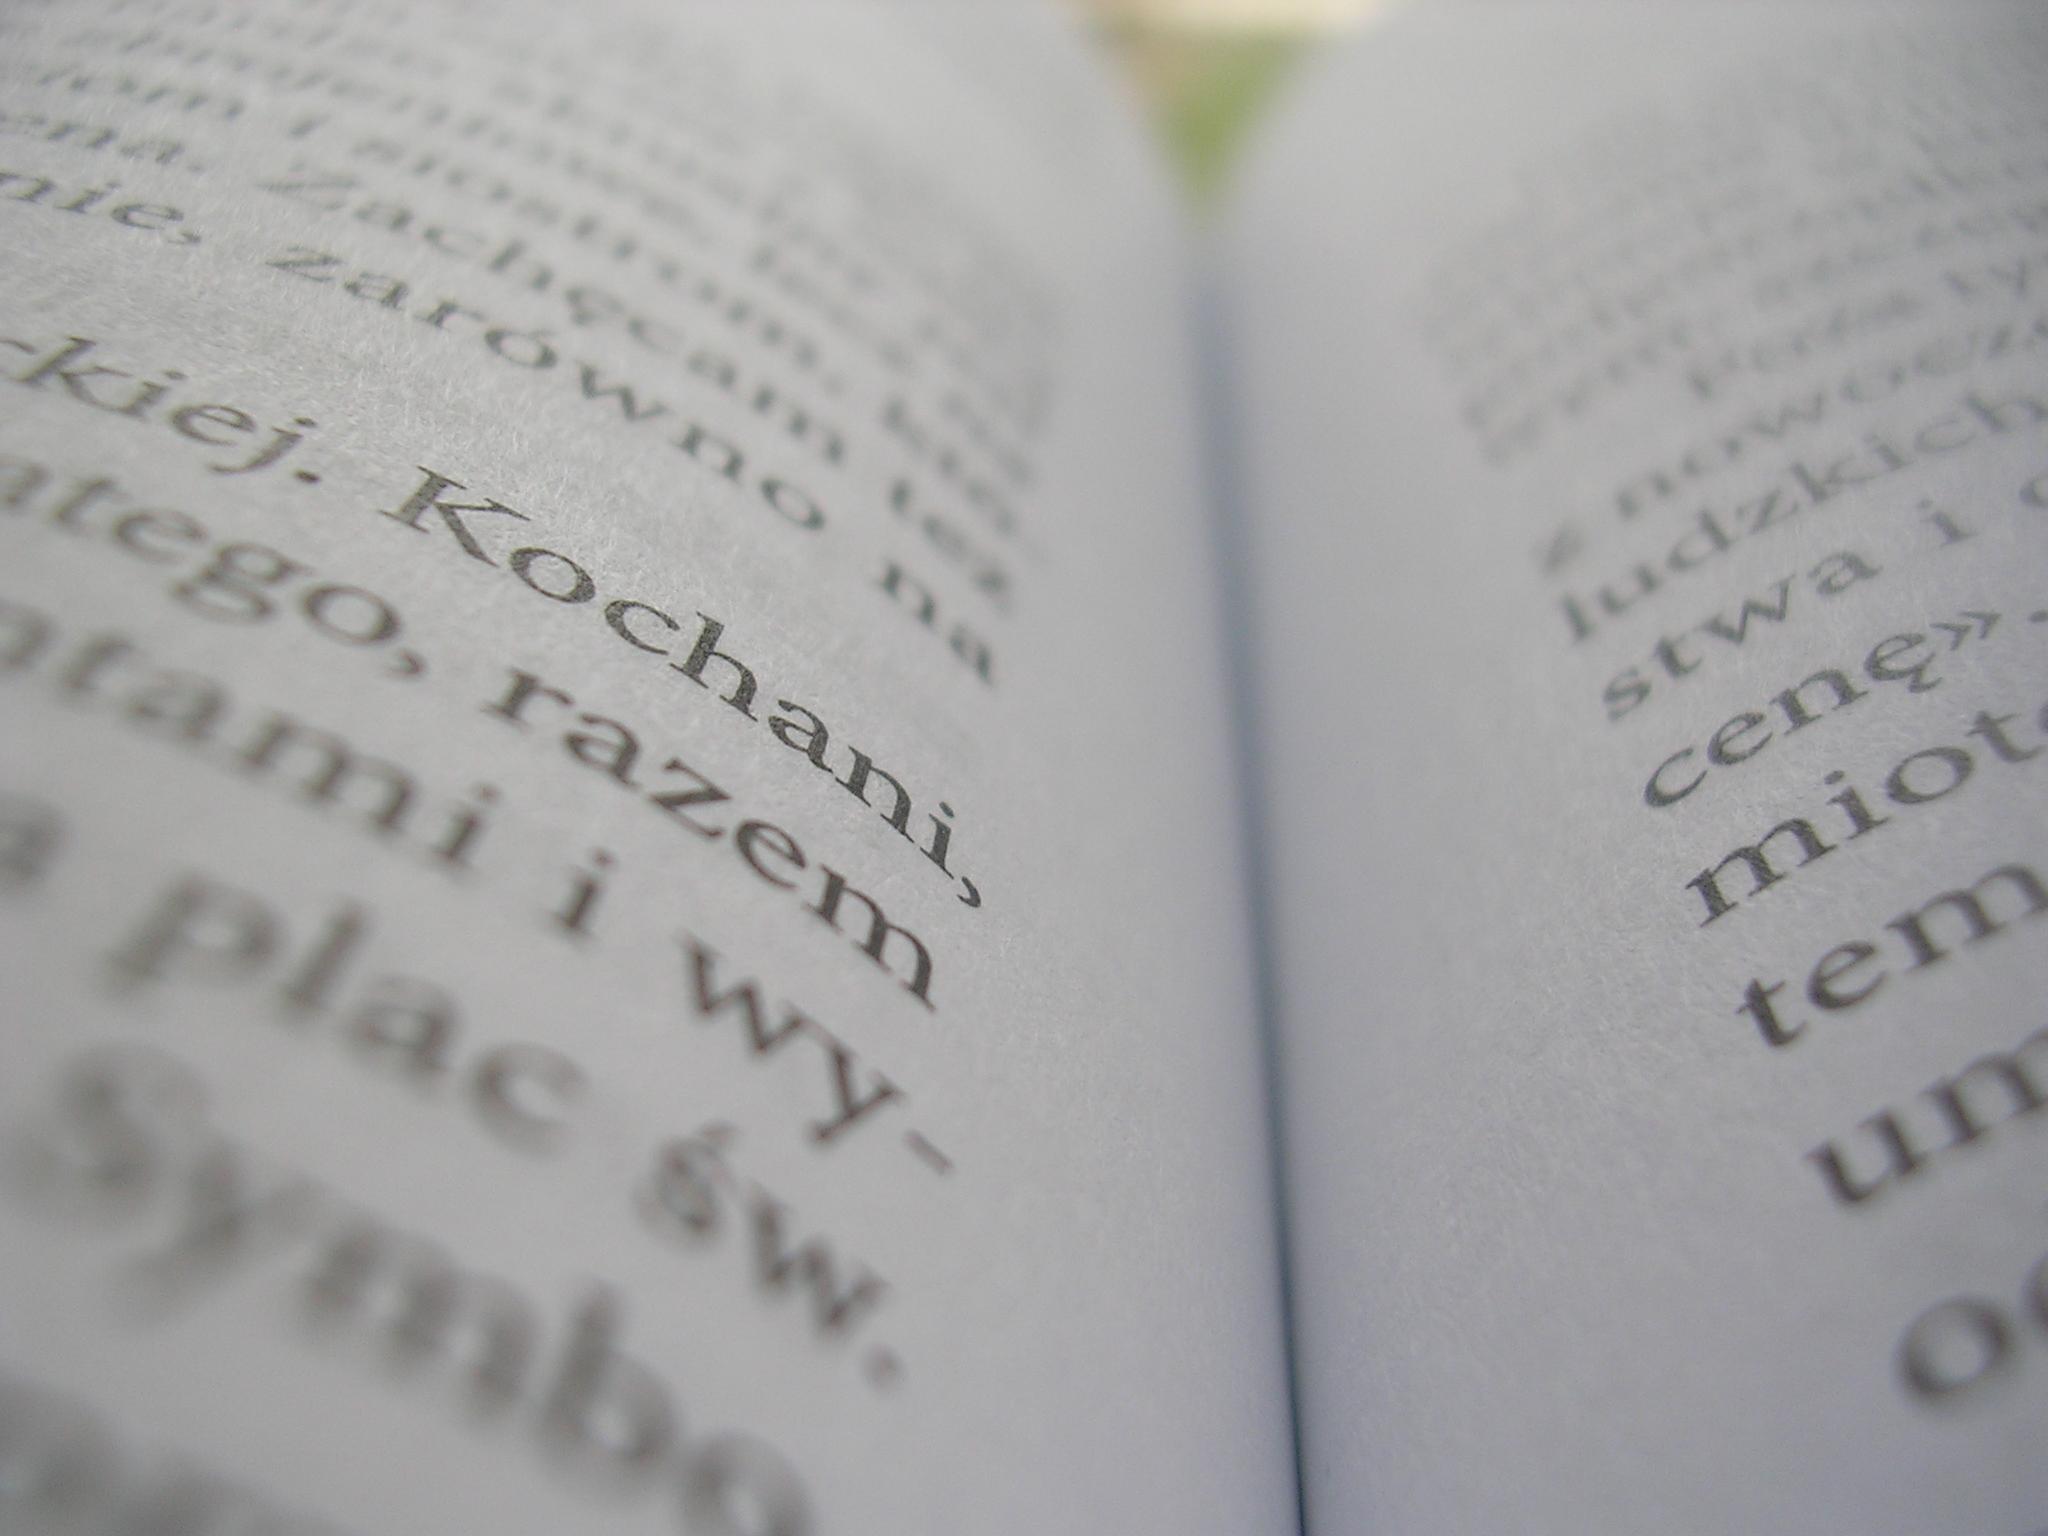 Znalezione obrazy dla zapytania ksiązki creative commons